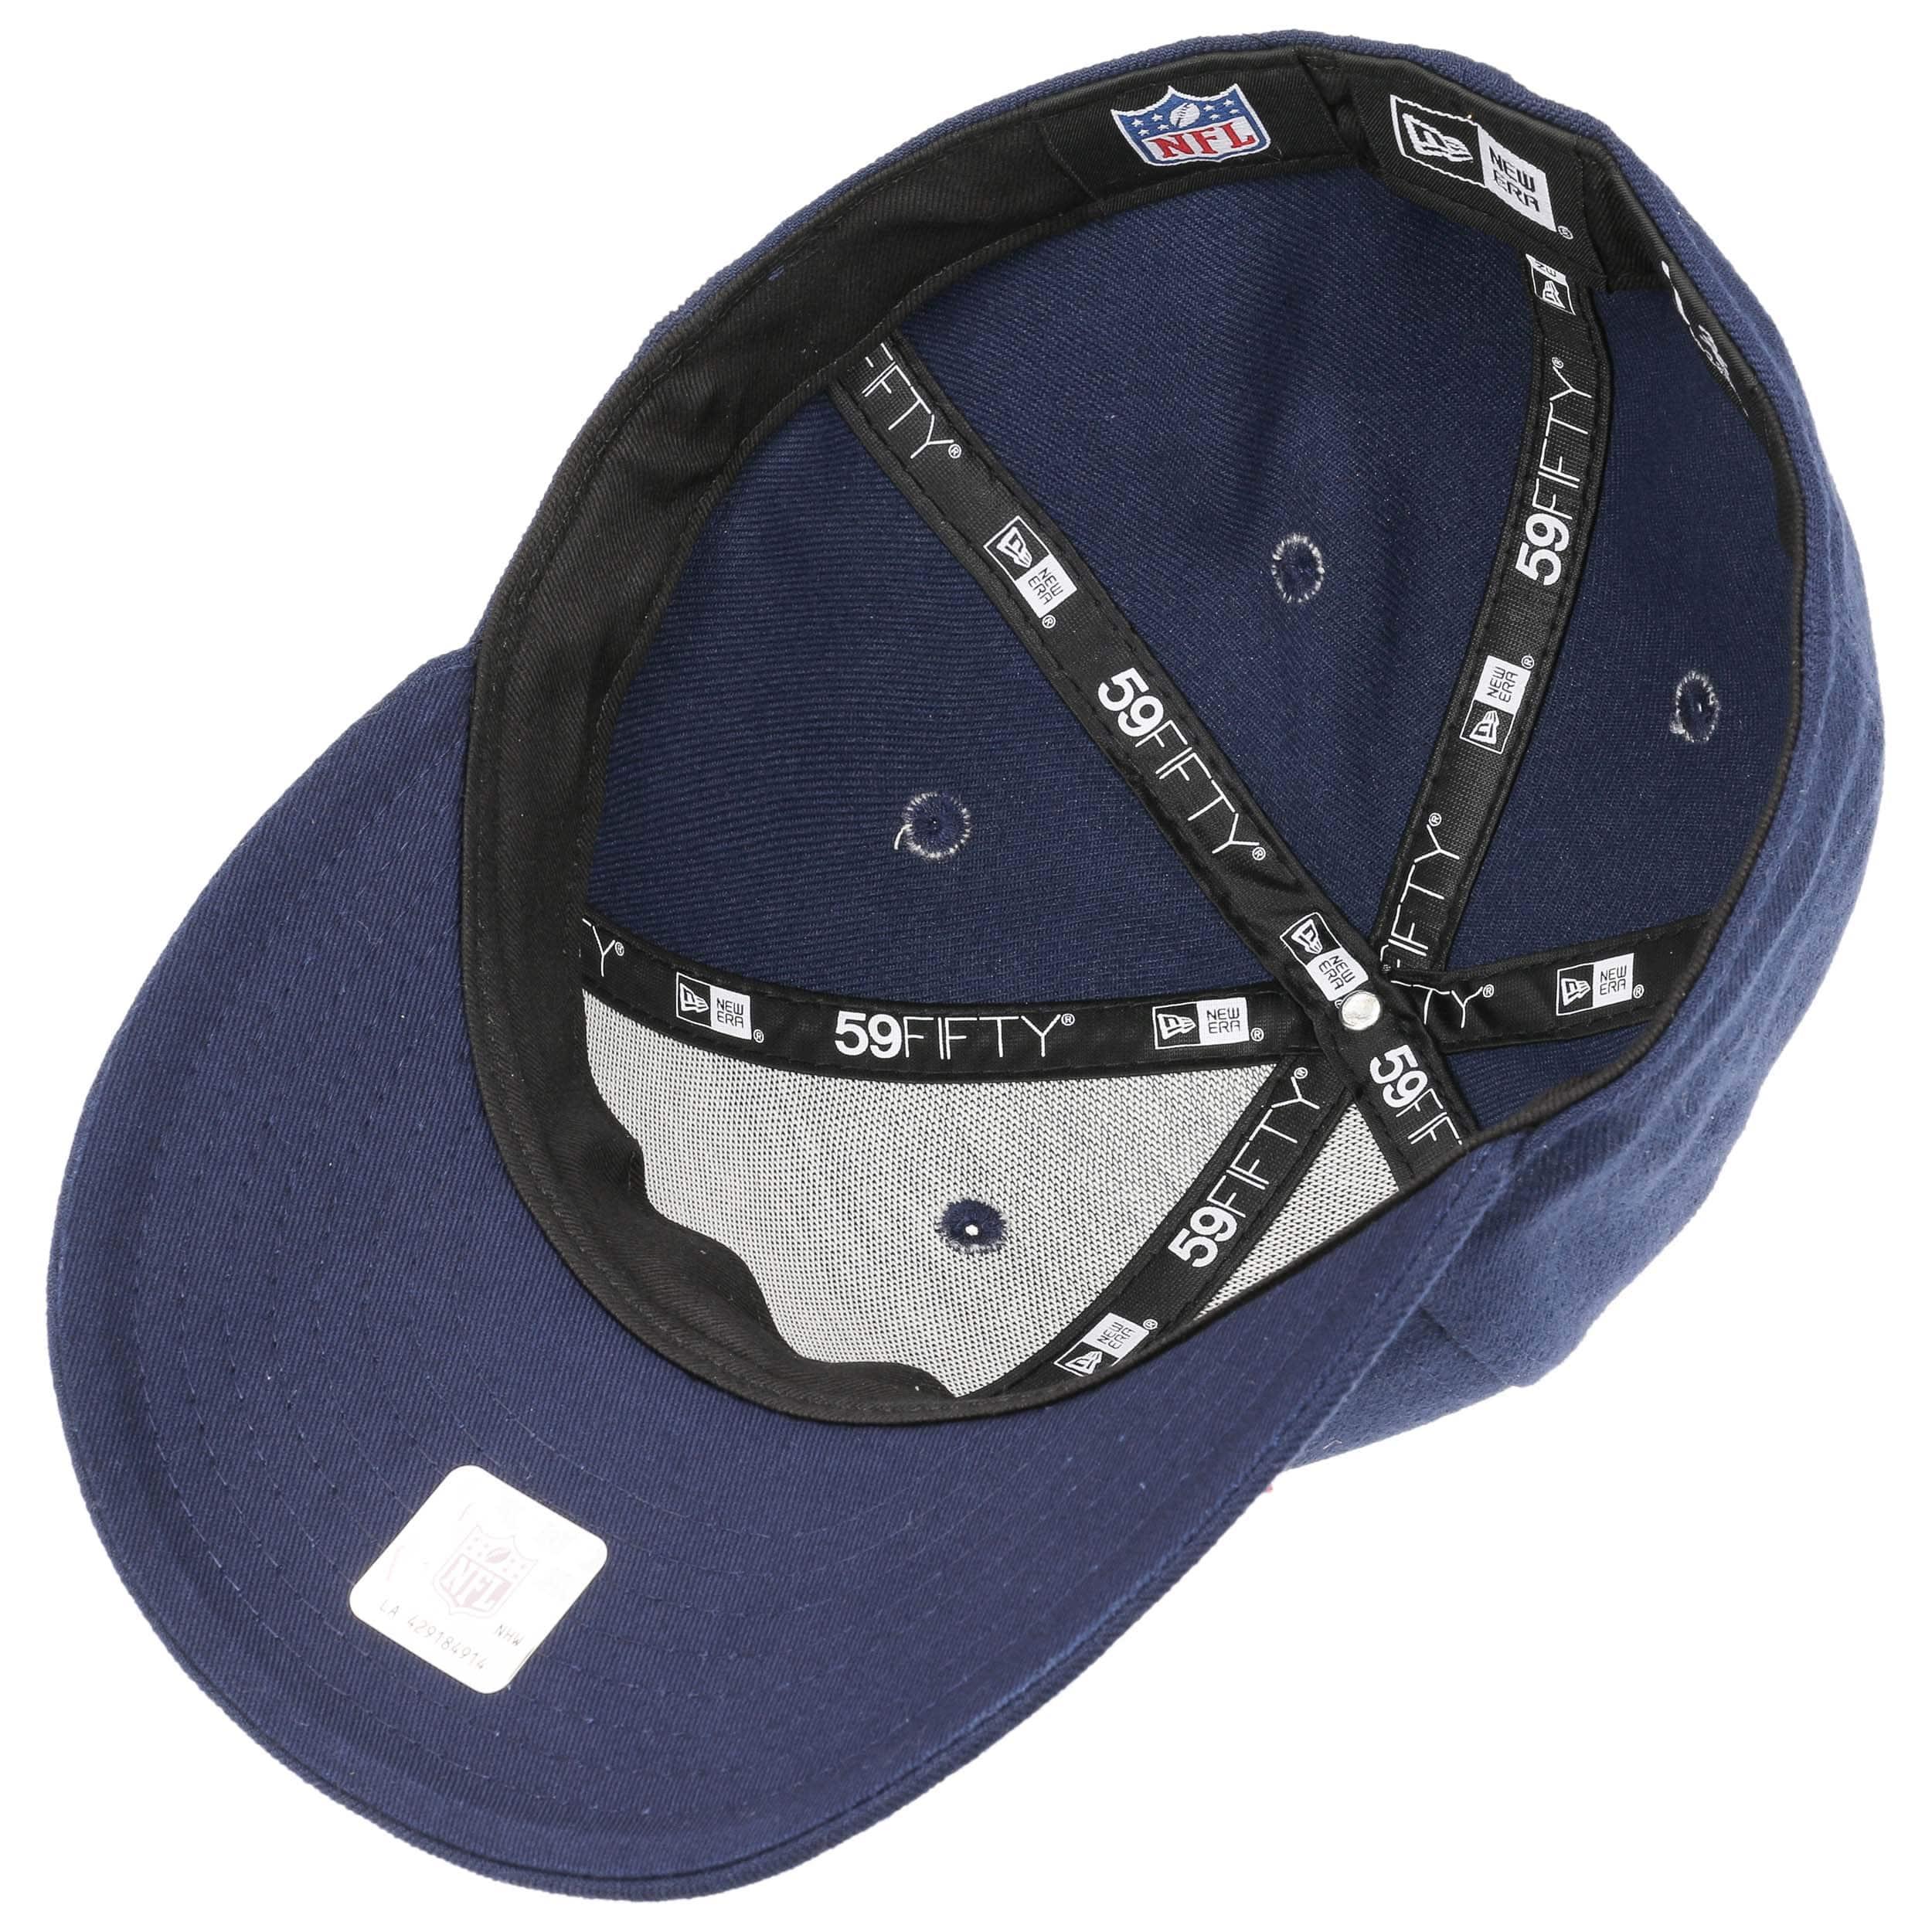 0e664ca3488 ... 59Fifty Low Profile Patriots Cap by New Era - navy 2 ...